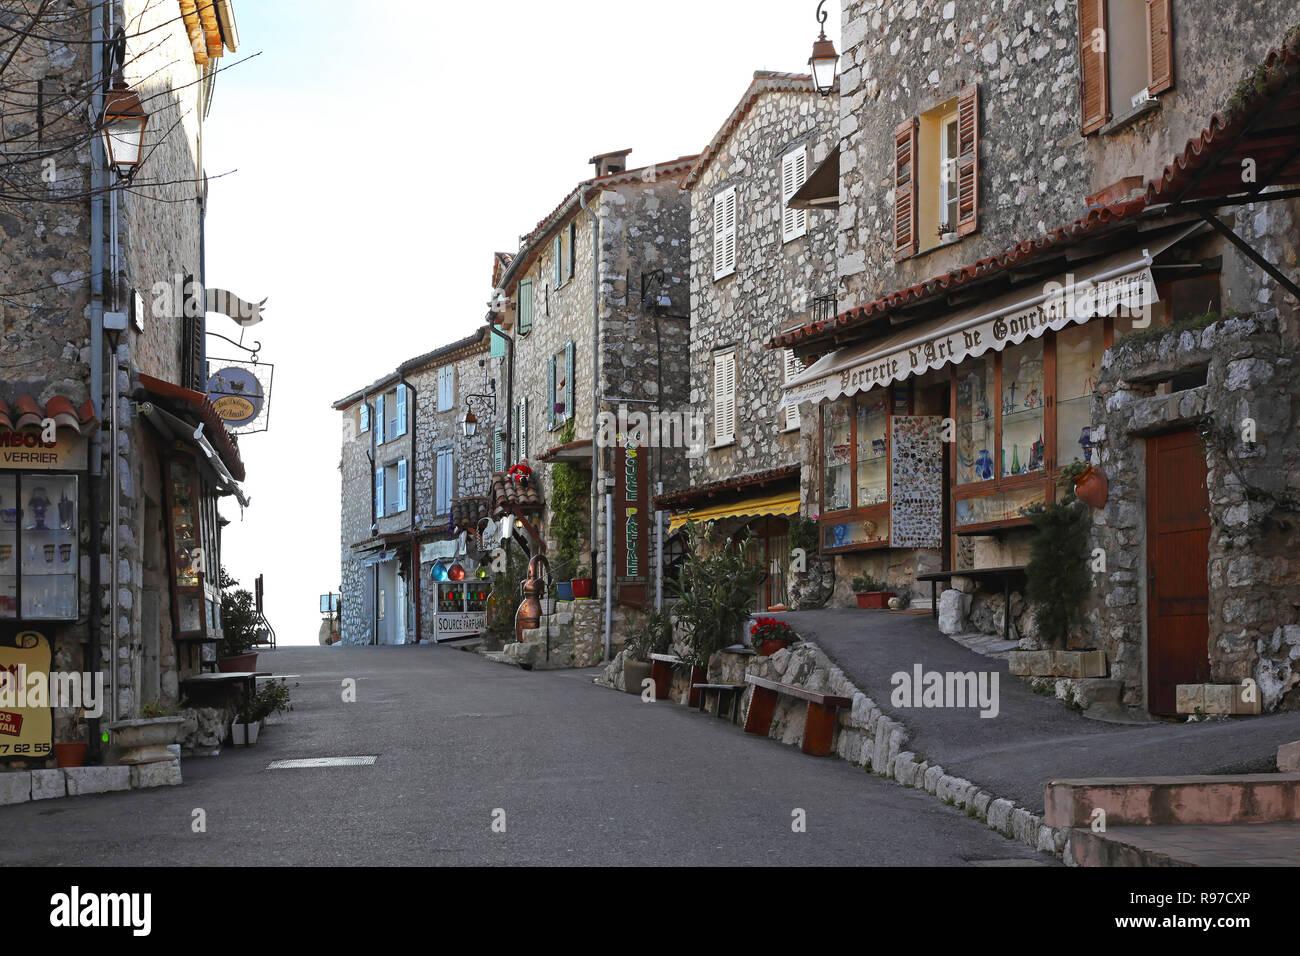 GOURDON, FRANCE - JANUARY 20: Main street in Gourdon on JANUARY 20, 2012. Main street with stone houses in Feudal style village Gourdon, France. - Stock Image